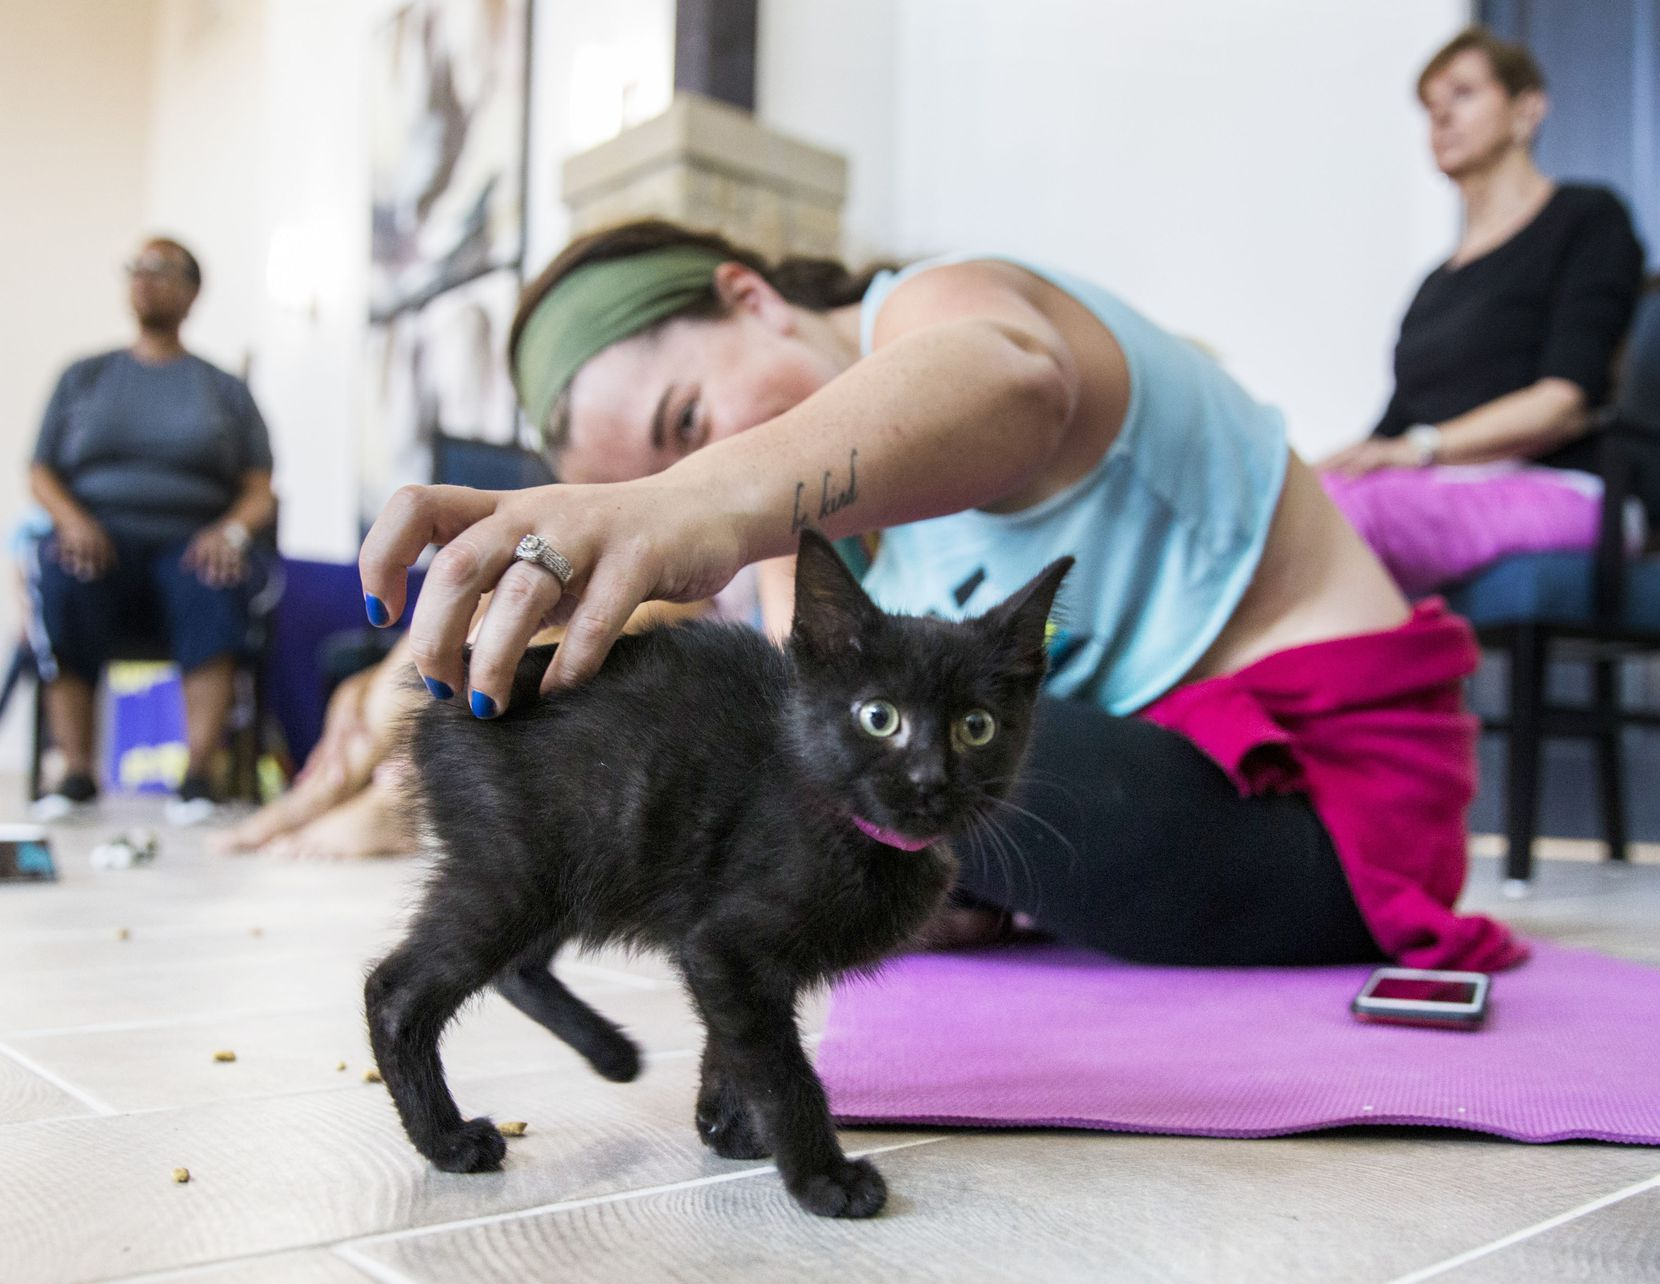 Anna Hurst petted a kitten during a yoga class.